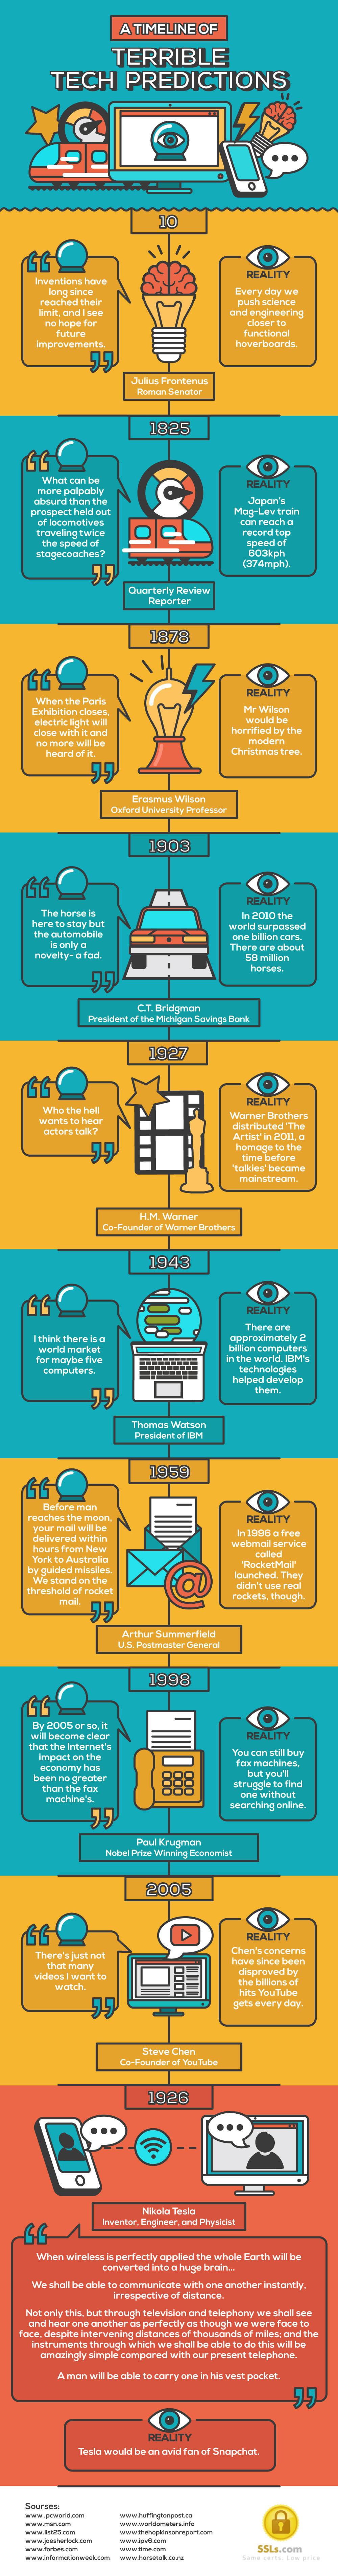 Terrible Tech Predictions Infographic